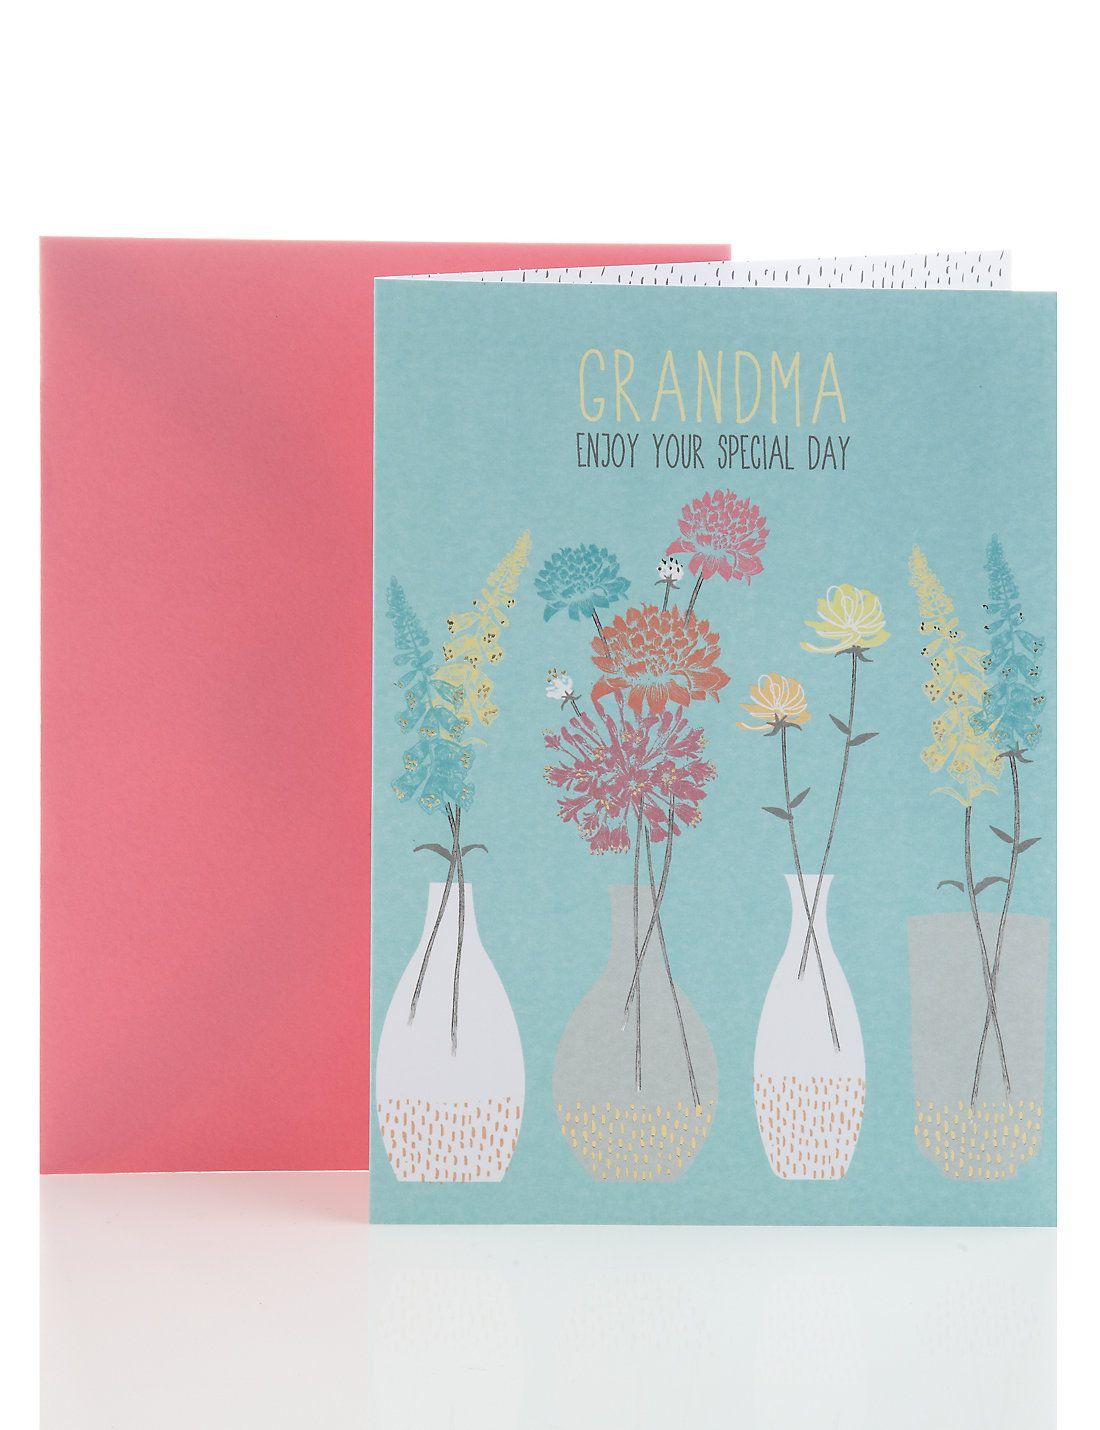 Floral Grandma Birthday Card M&S Grandma birthday card